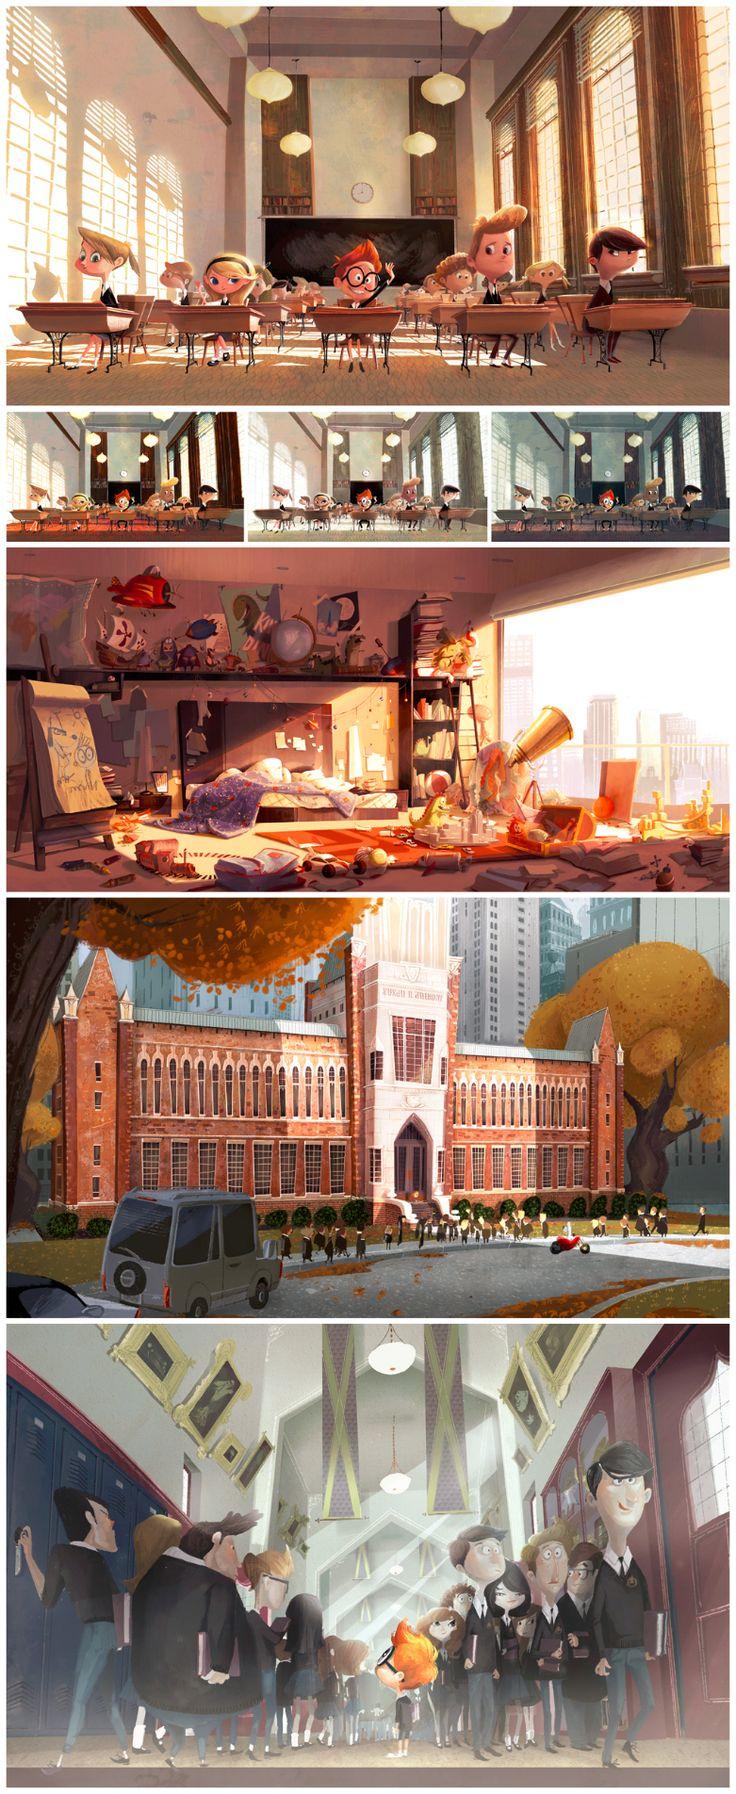 Priscilla Wong - Mr. Peabody & Sherman concept art